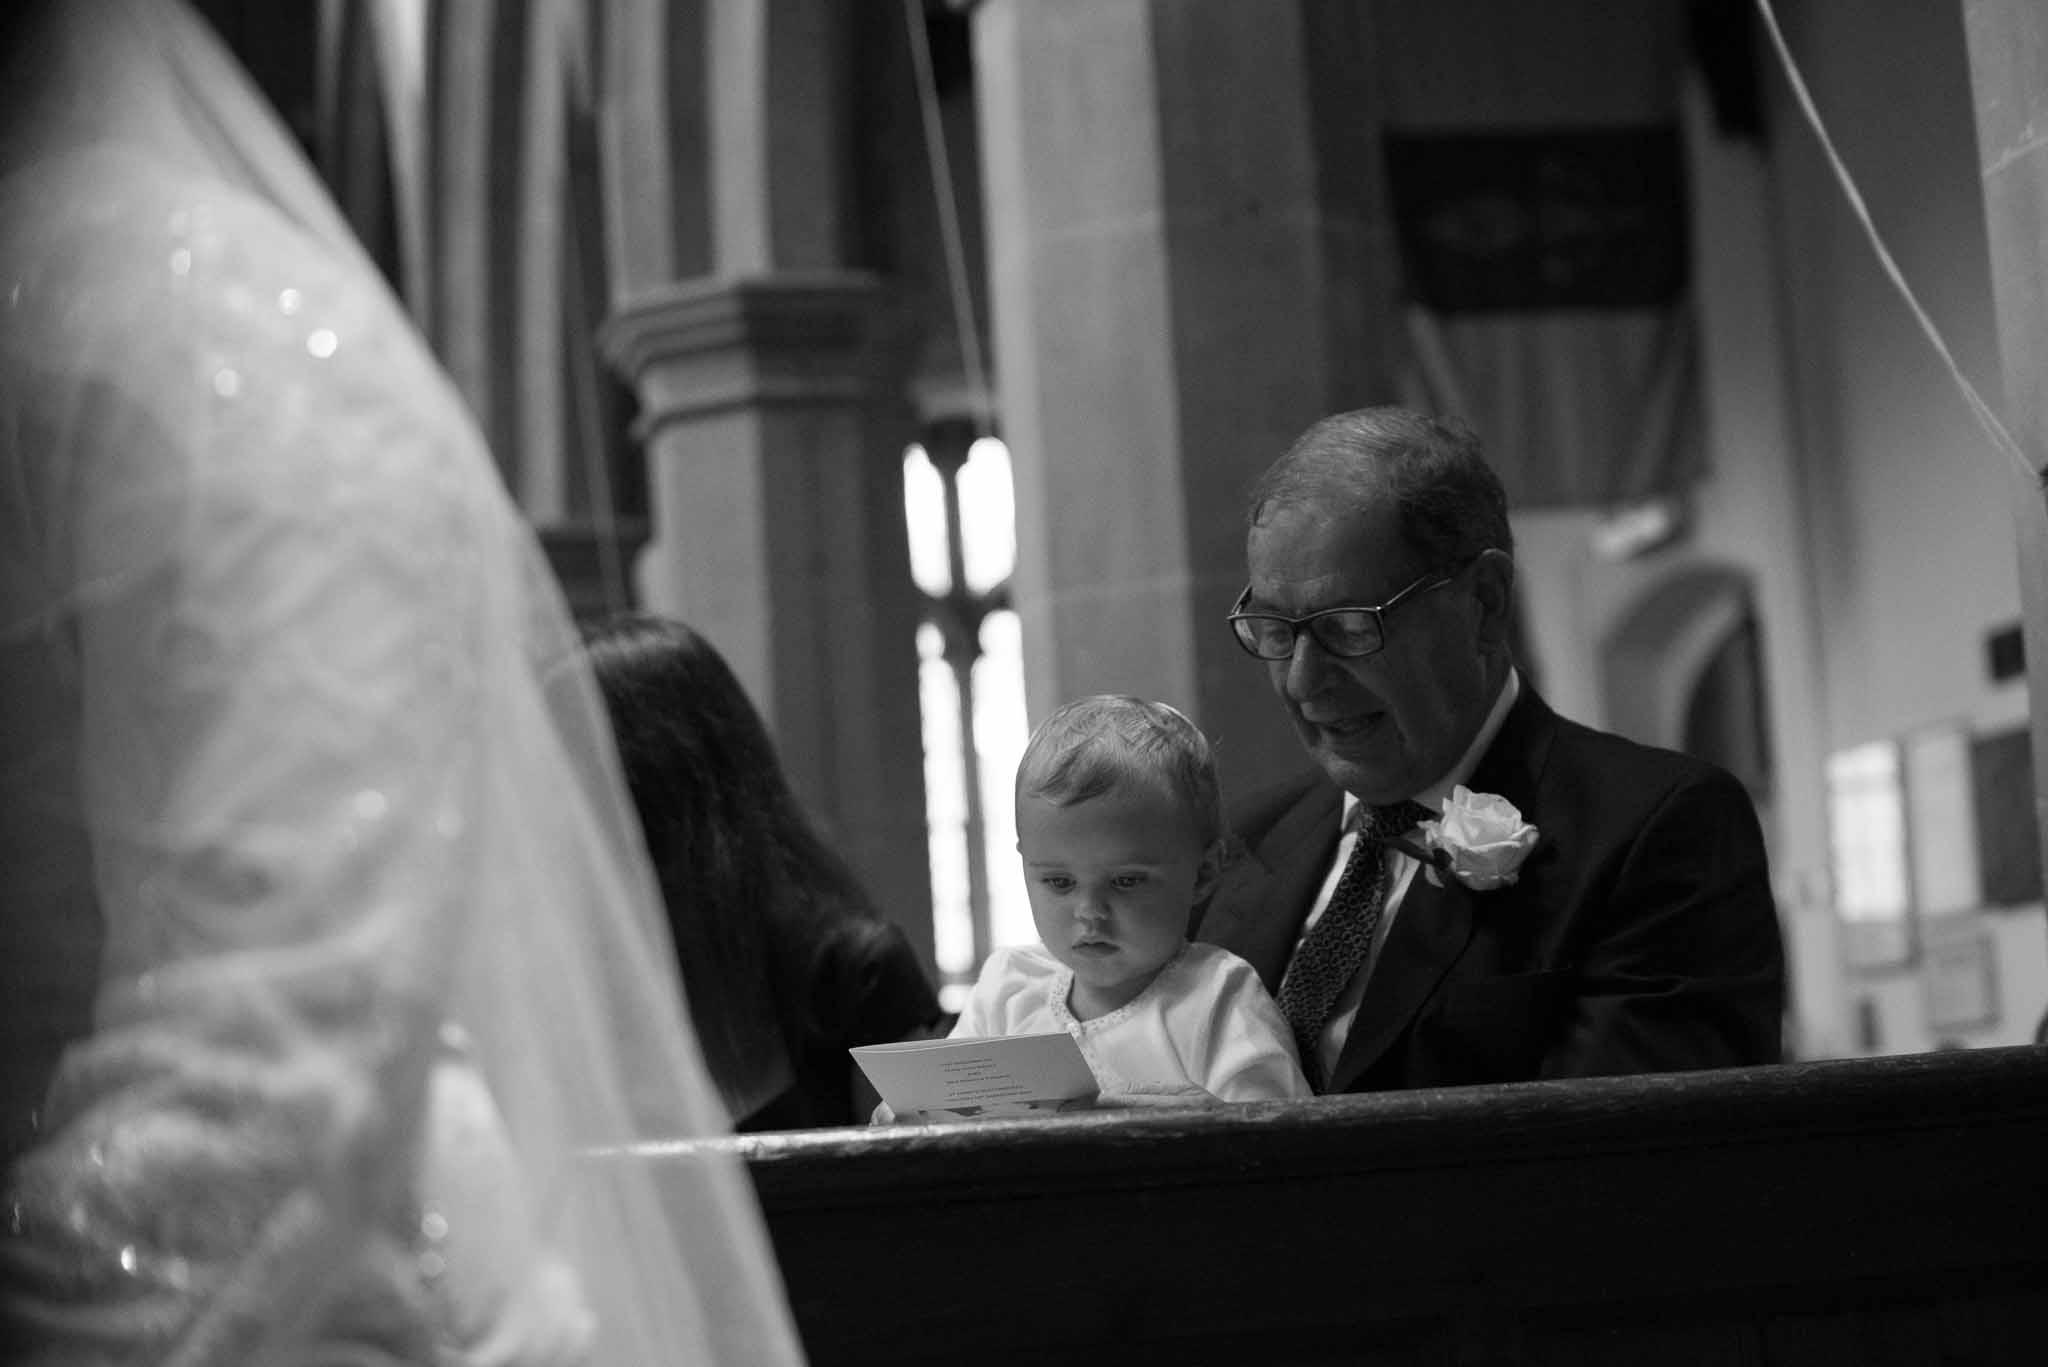 St Mary & All Saints Beaconsfield, St Mary's Beaconsfield, Beaconsfield wedding photographer, Beaconsfield wedding, Buckinghamshire wedding Reportage wedding photography